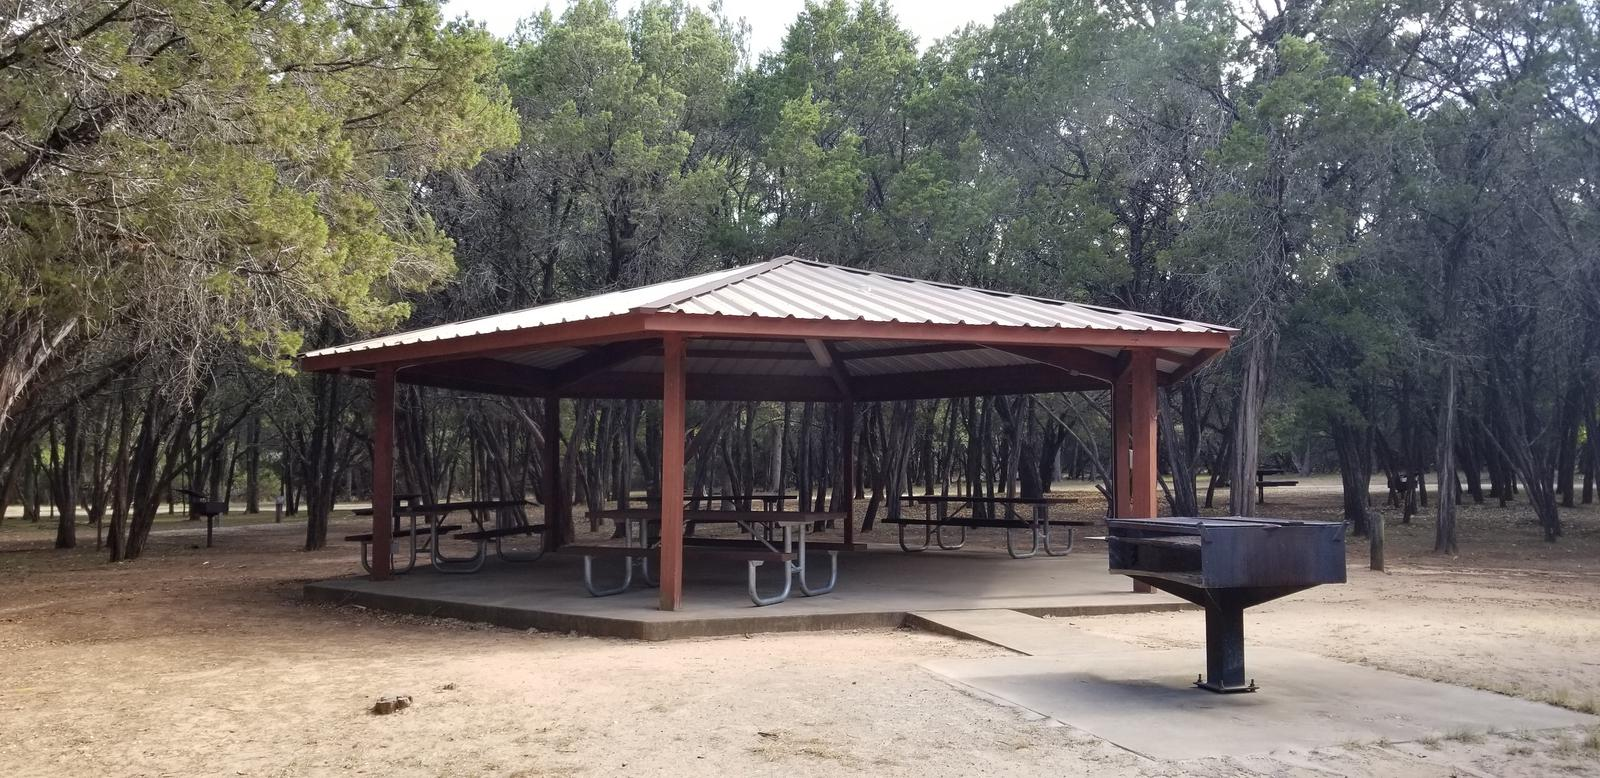 West Group Shelter